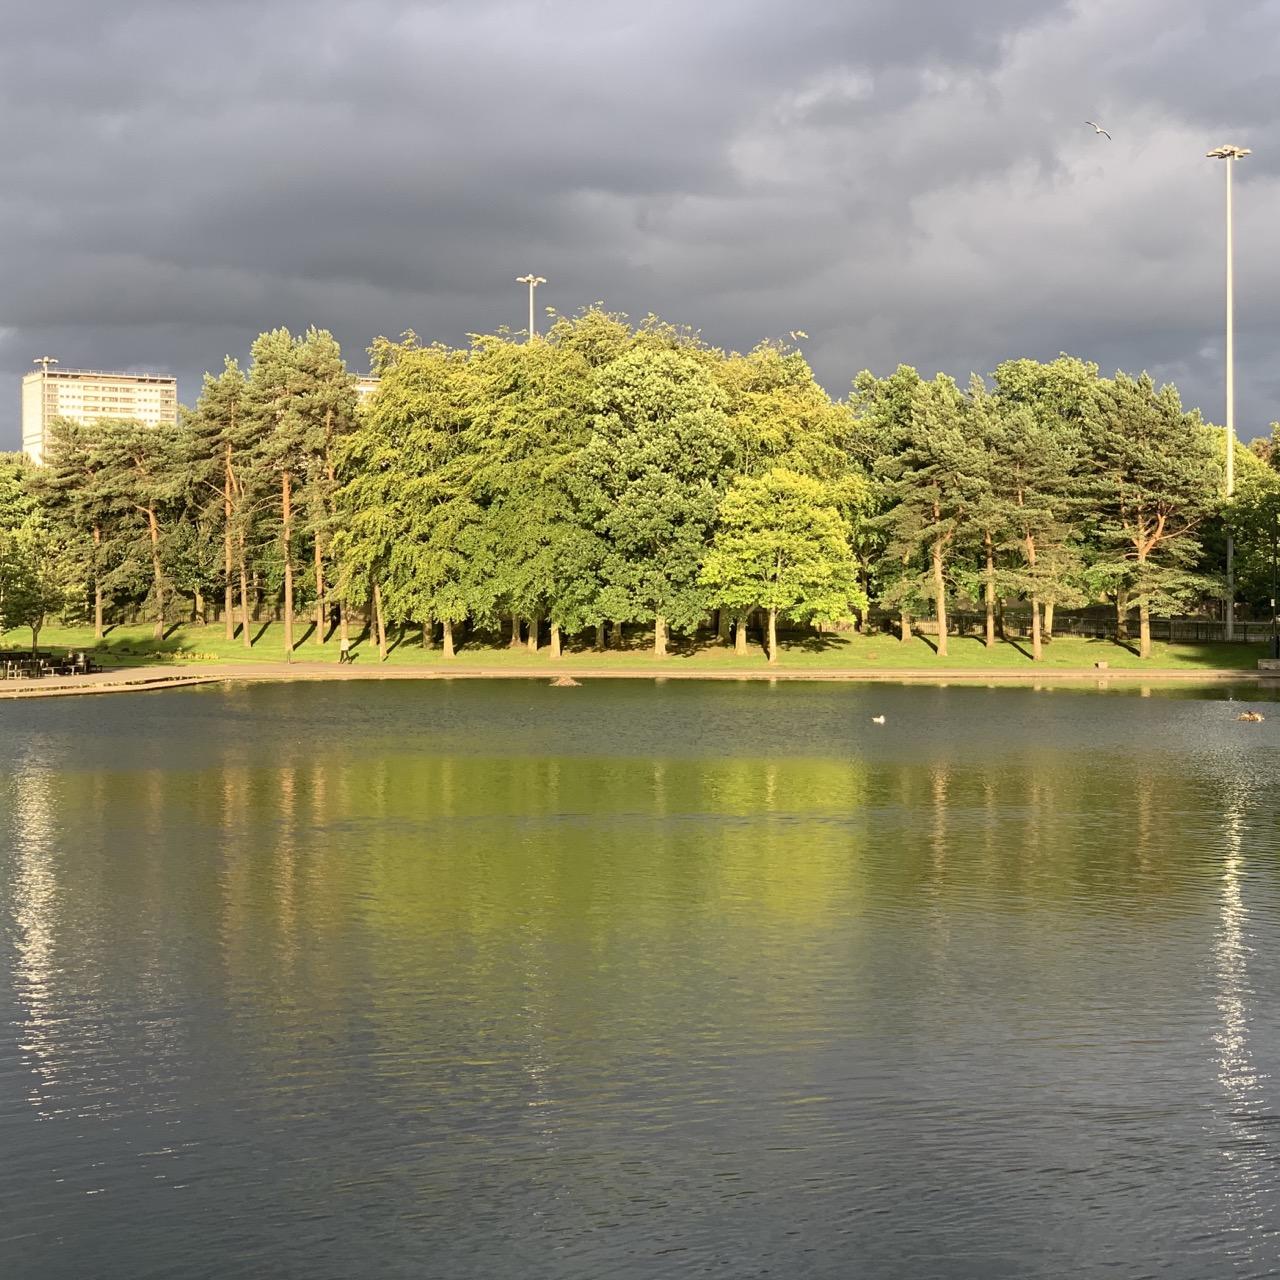 Victoria Park Pond, dark clouds, bright light on trees